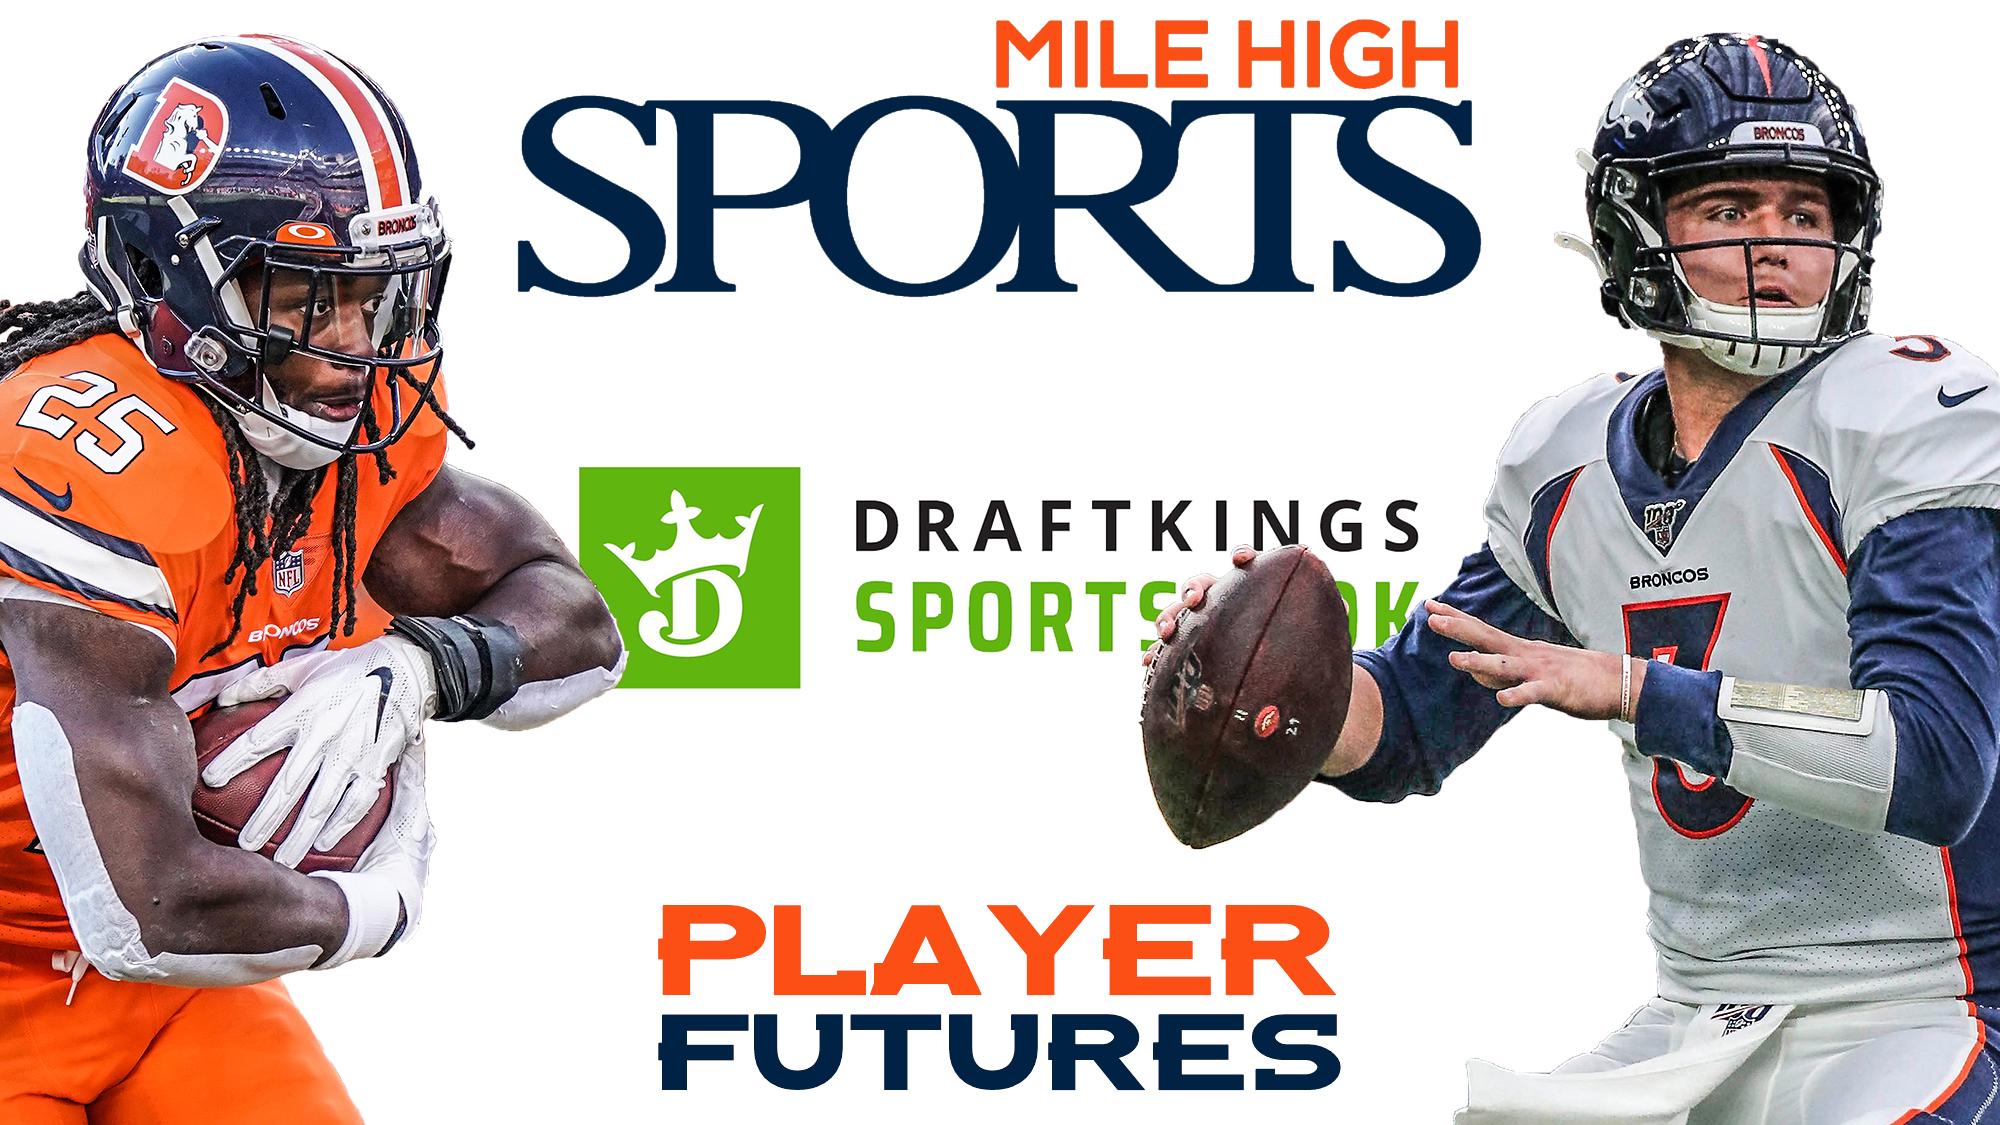 Mile High Sports, Denver Broncos, DraftKings NFL 2021 Player Futures